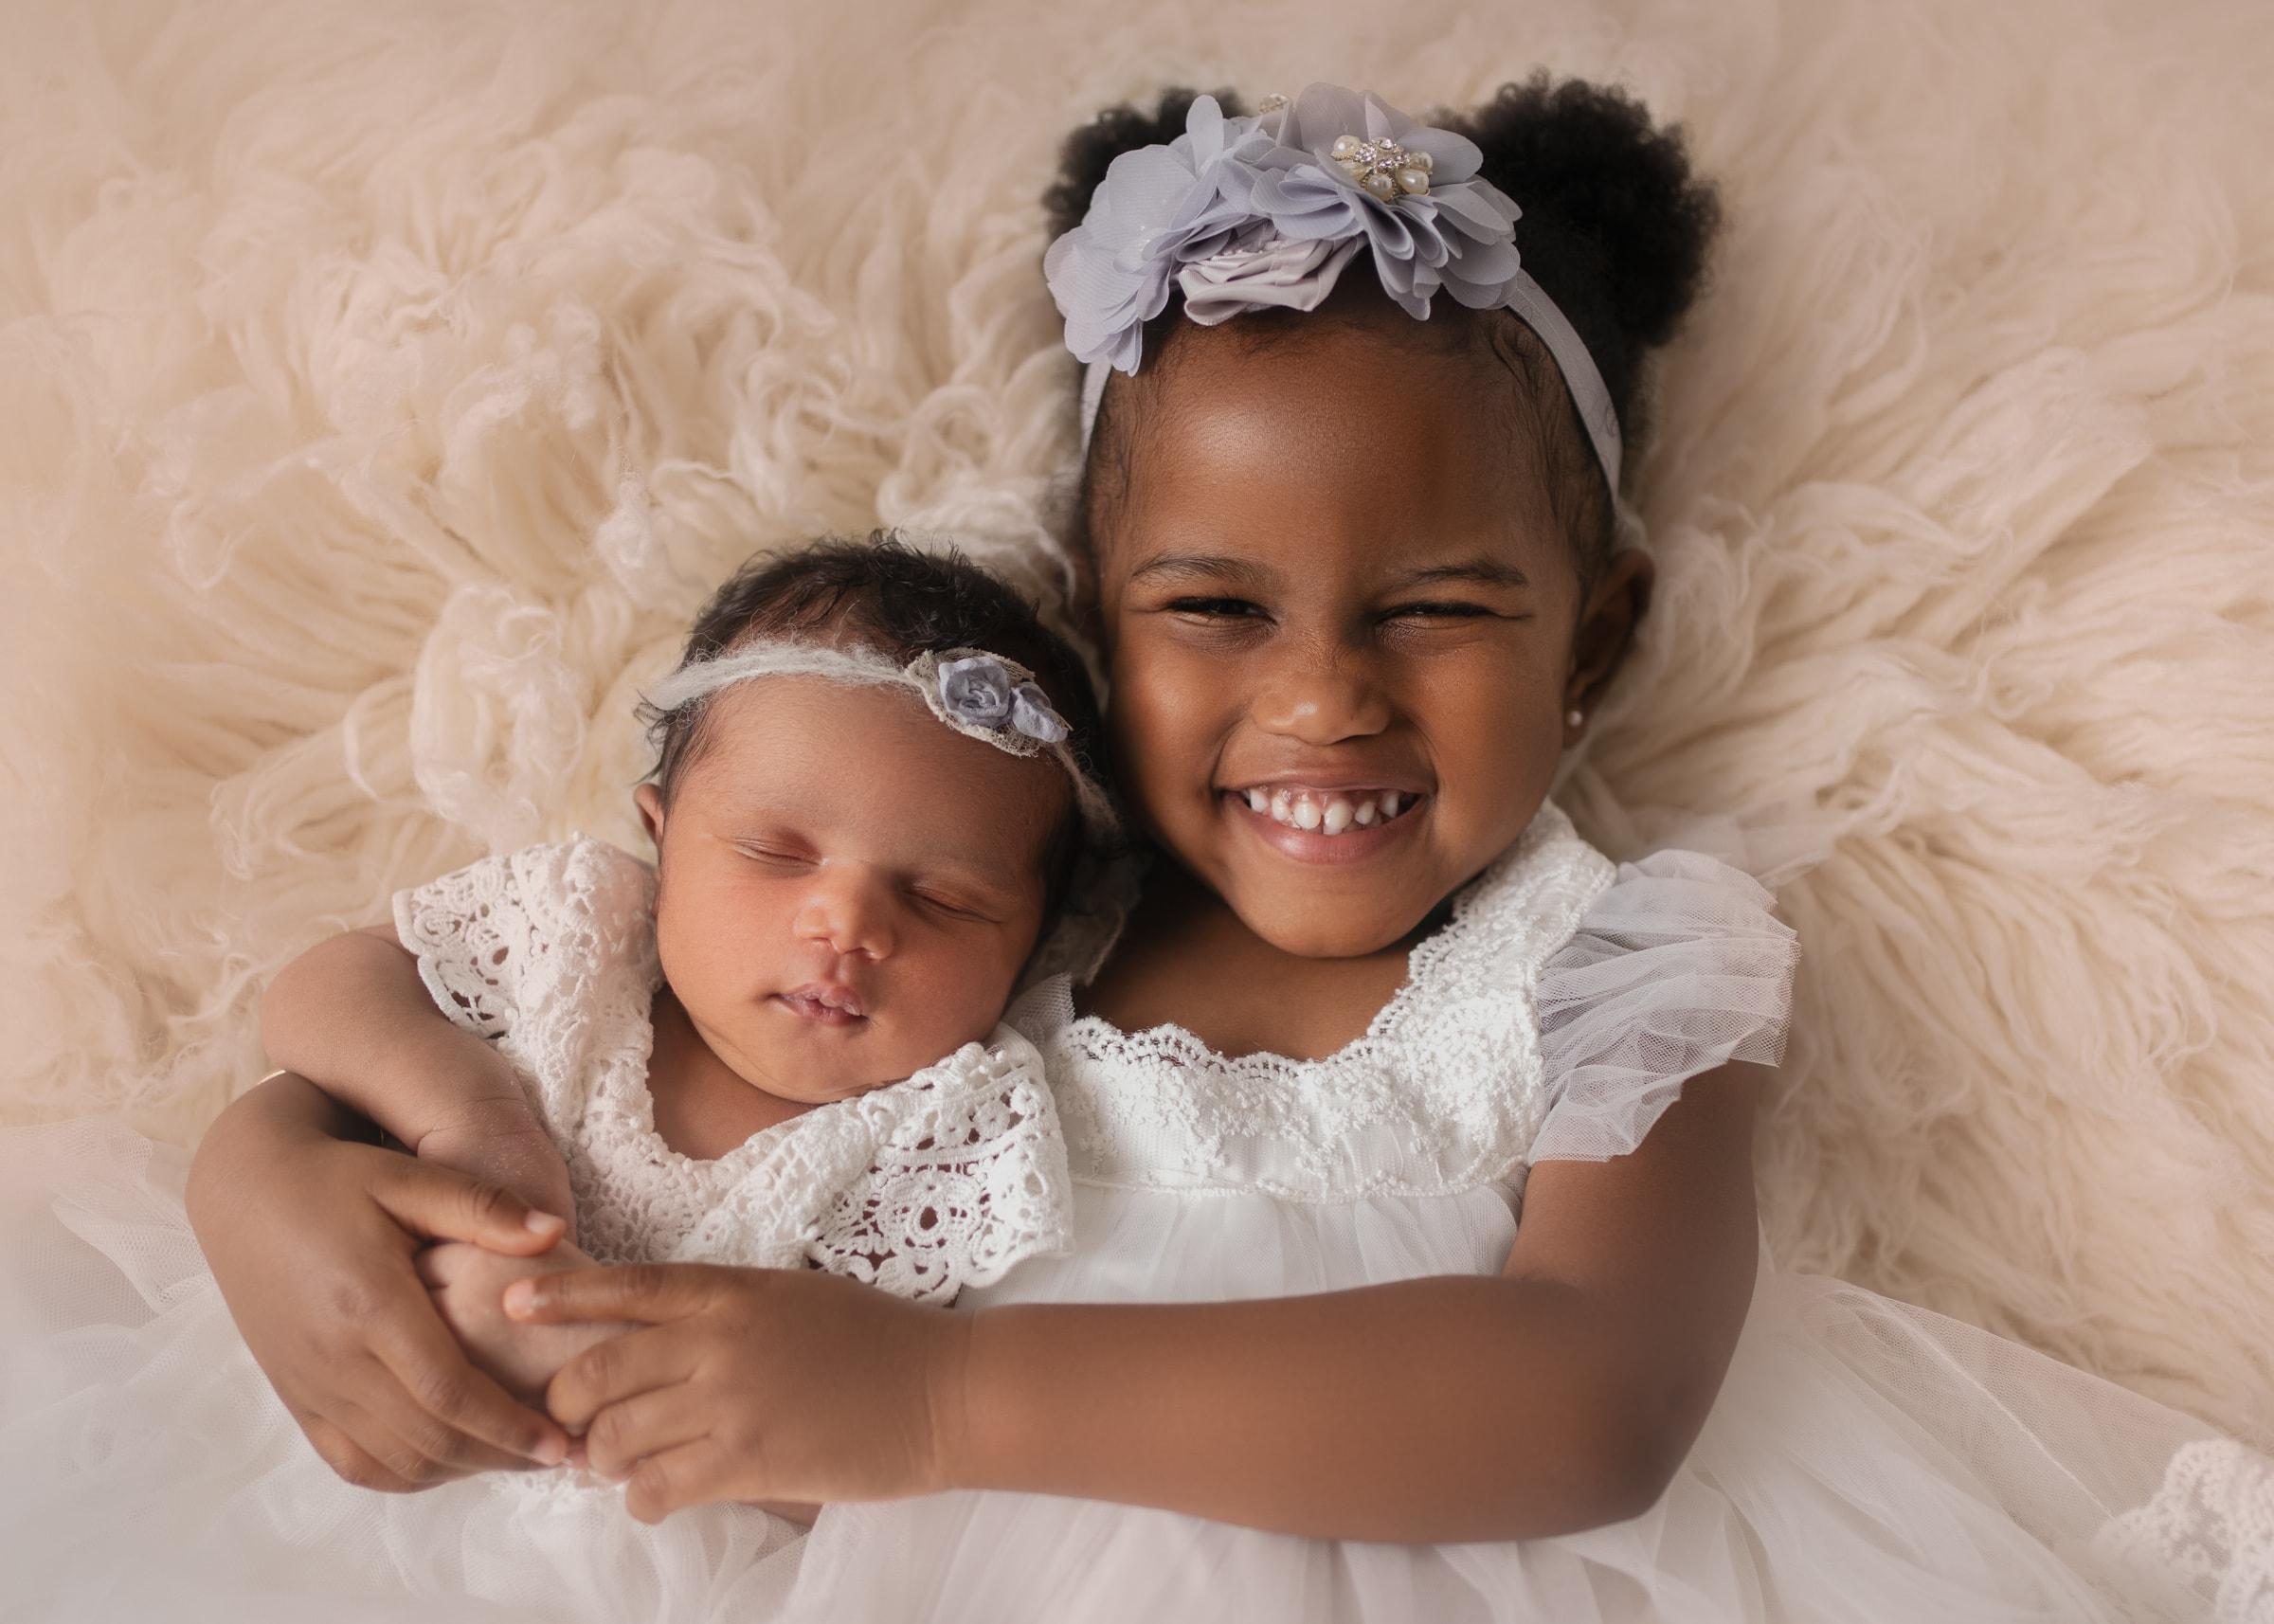 raleigh baby photographer – baby jovi